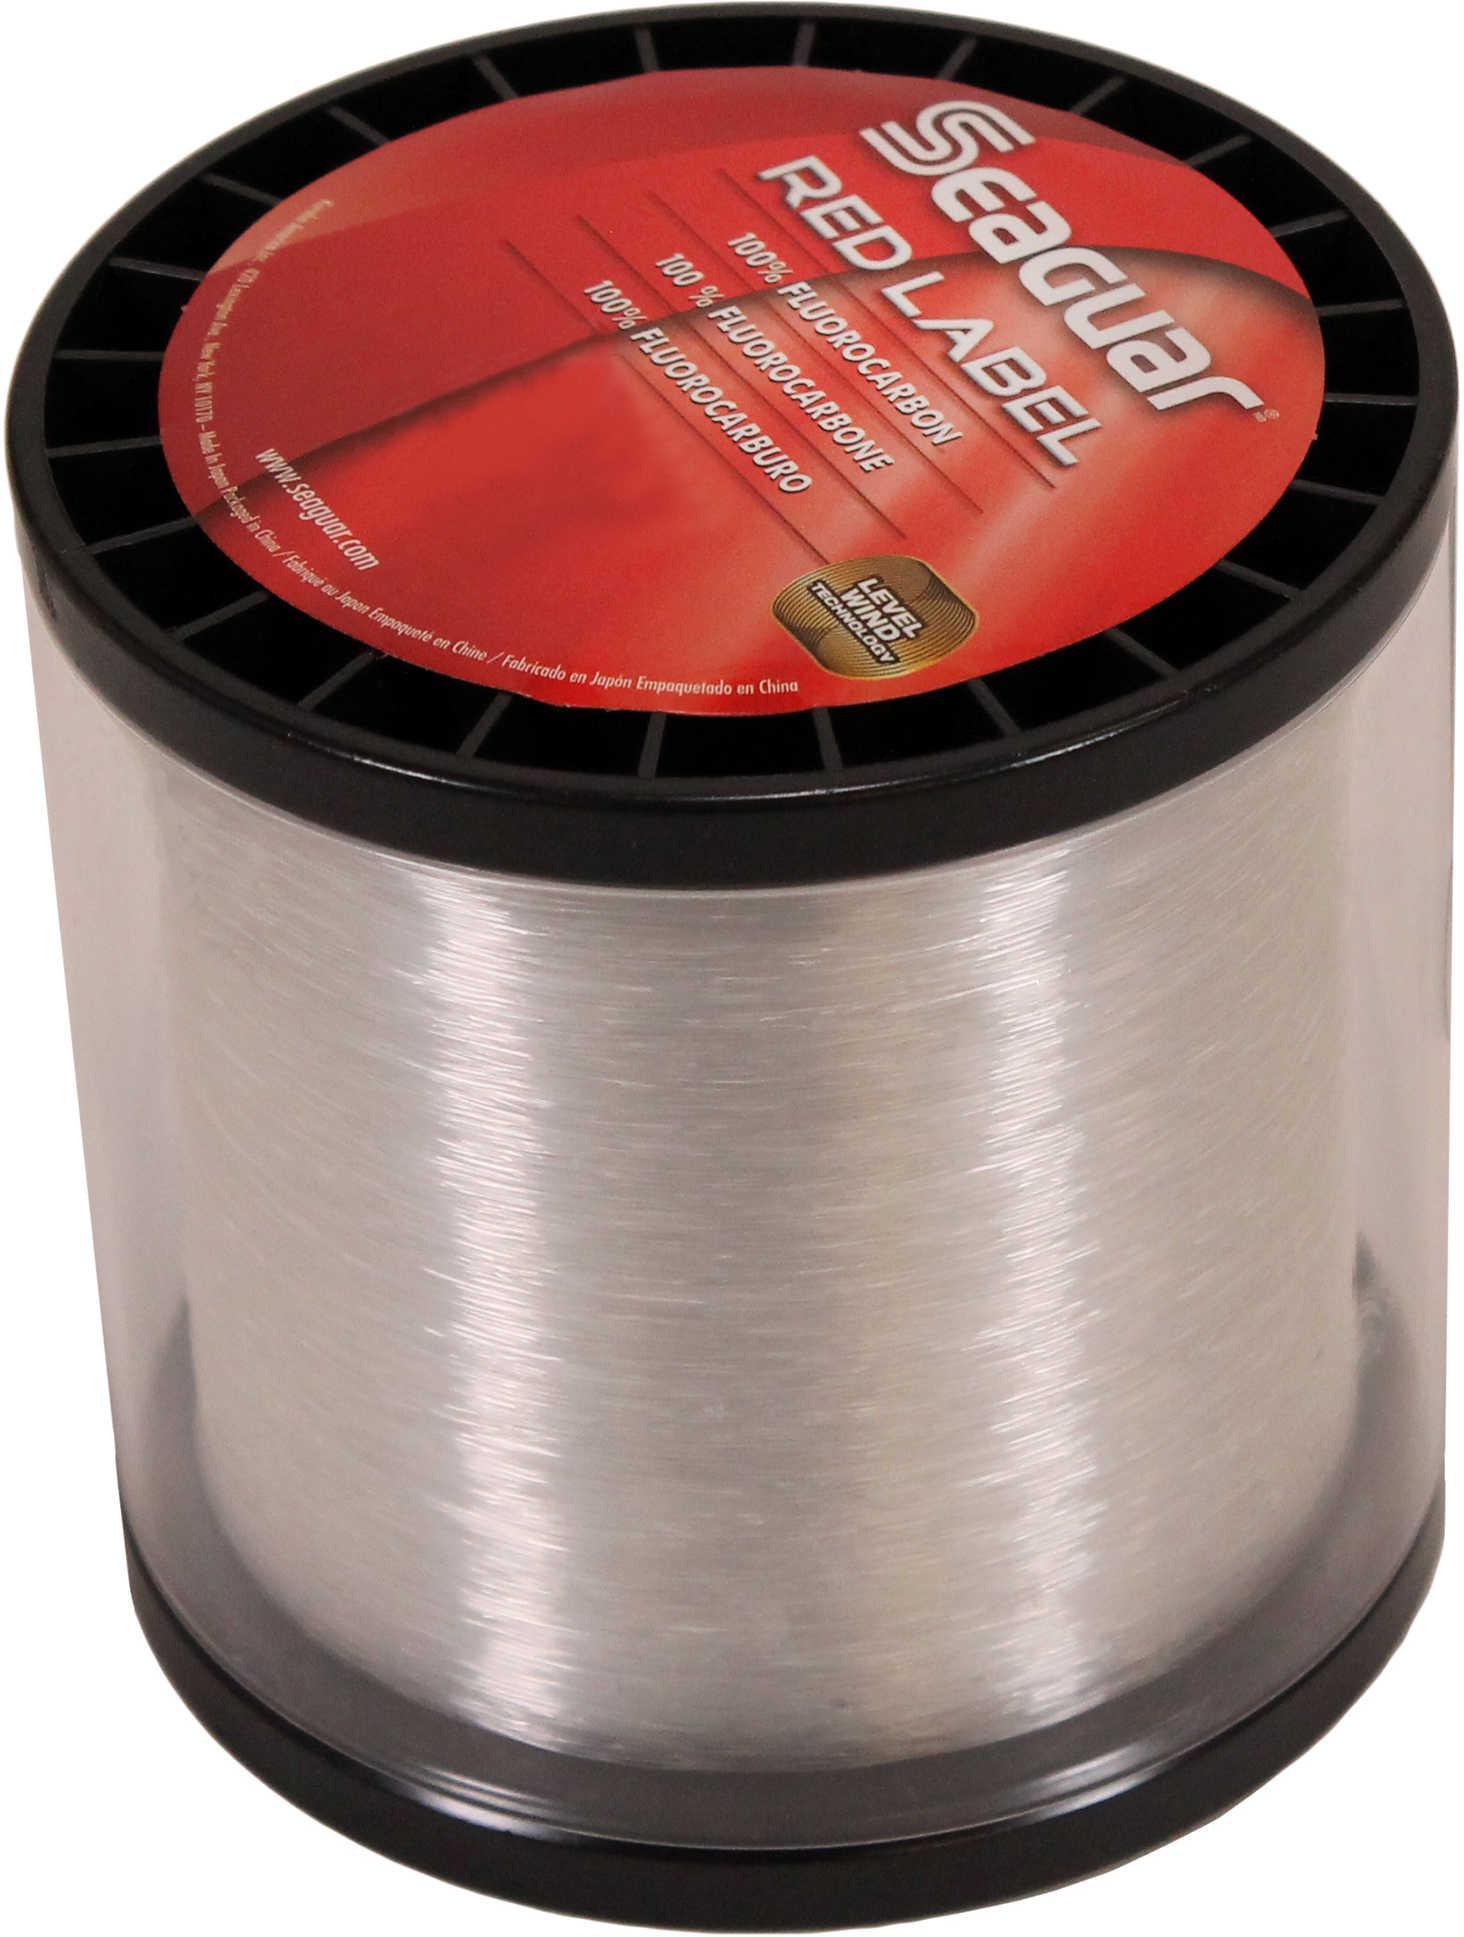 Seaguar / Kureha America Seaguar Red Label Fluorocarbon Clear 1000yds 20lb Fishing Line 20RM-1000